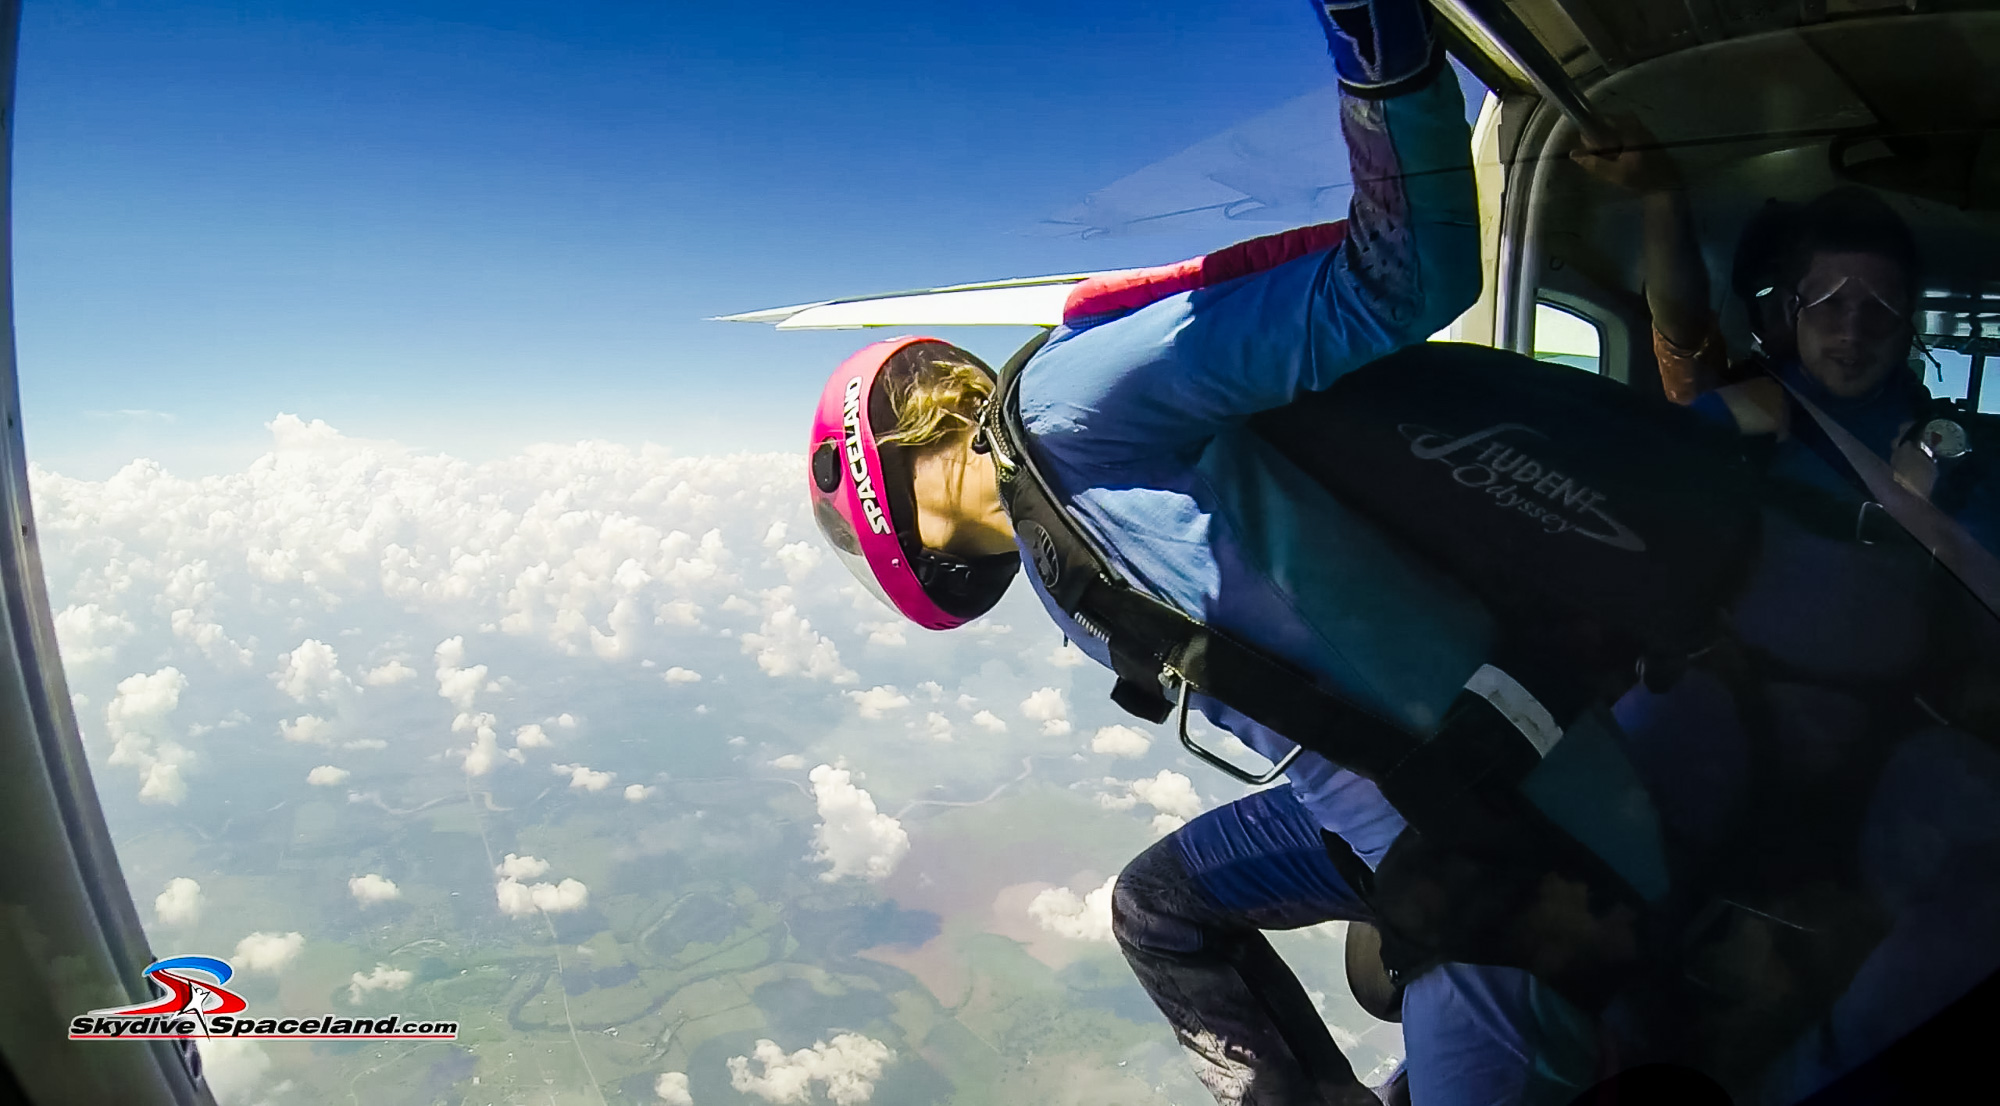 Skydiving Day-Video Screenshots-0015.jpg